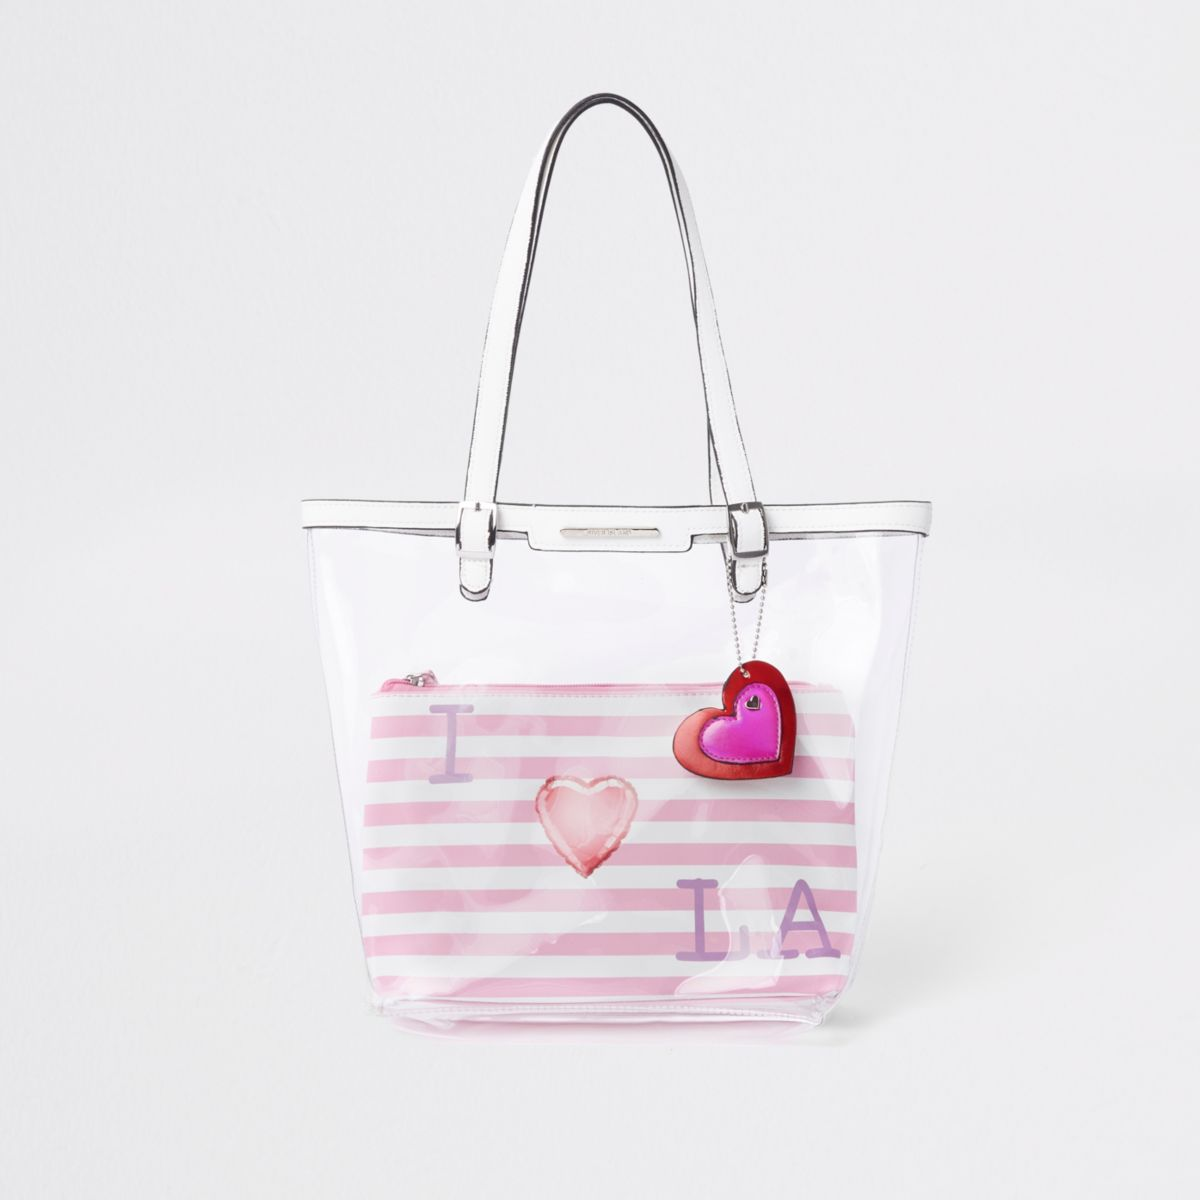 Girls pink clear 'I love LA' shopper bag